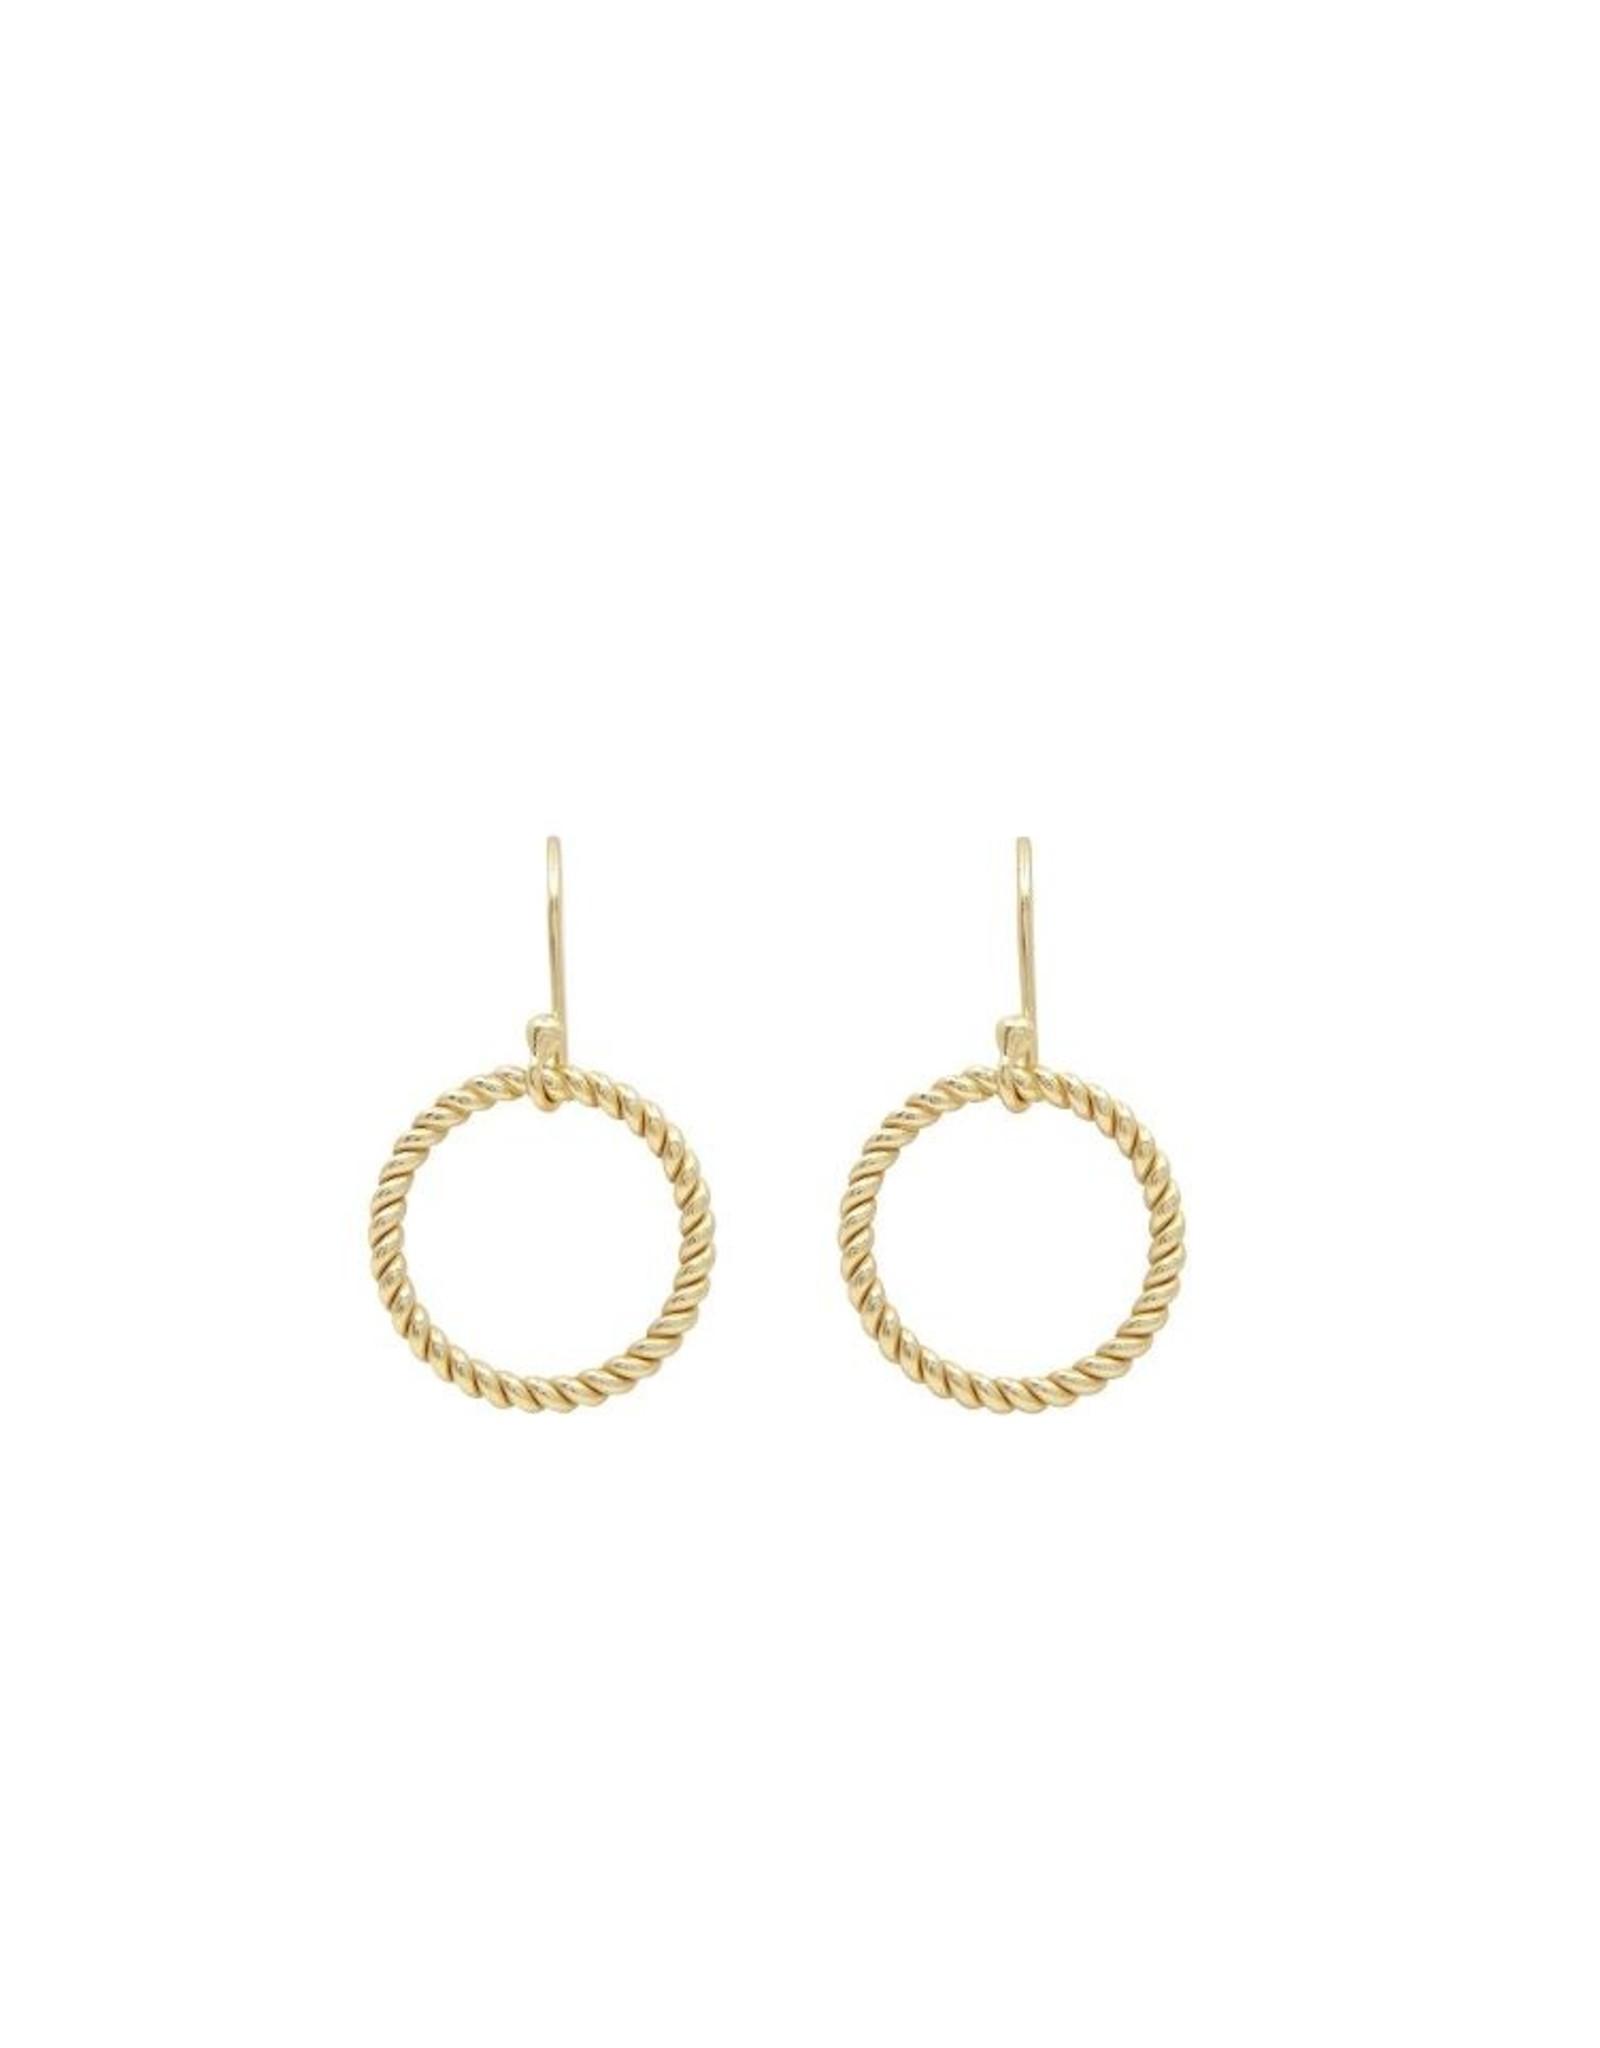 Ohrringe Twisted Circle 925 Silber vergoldet